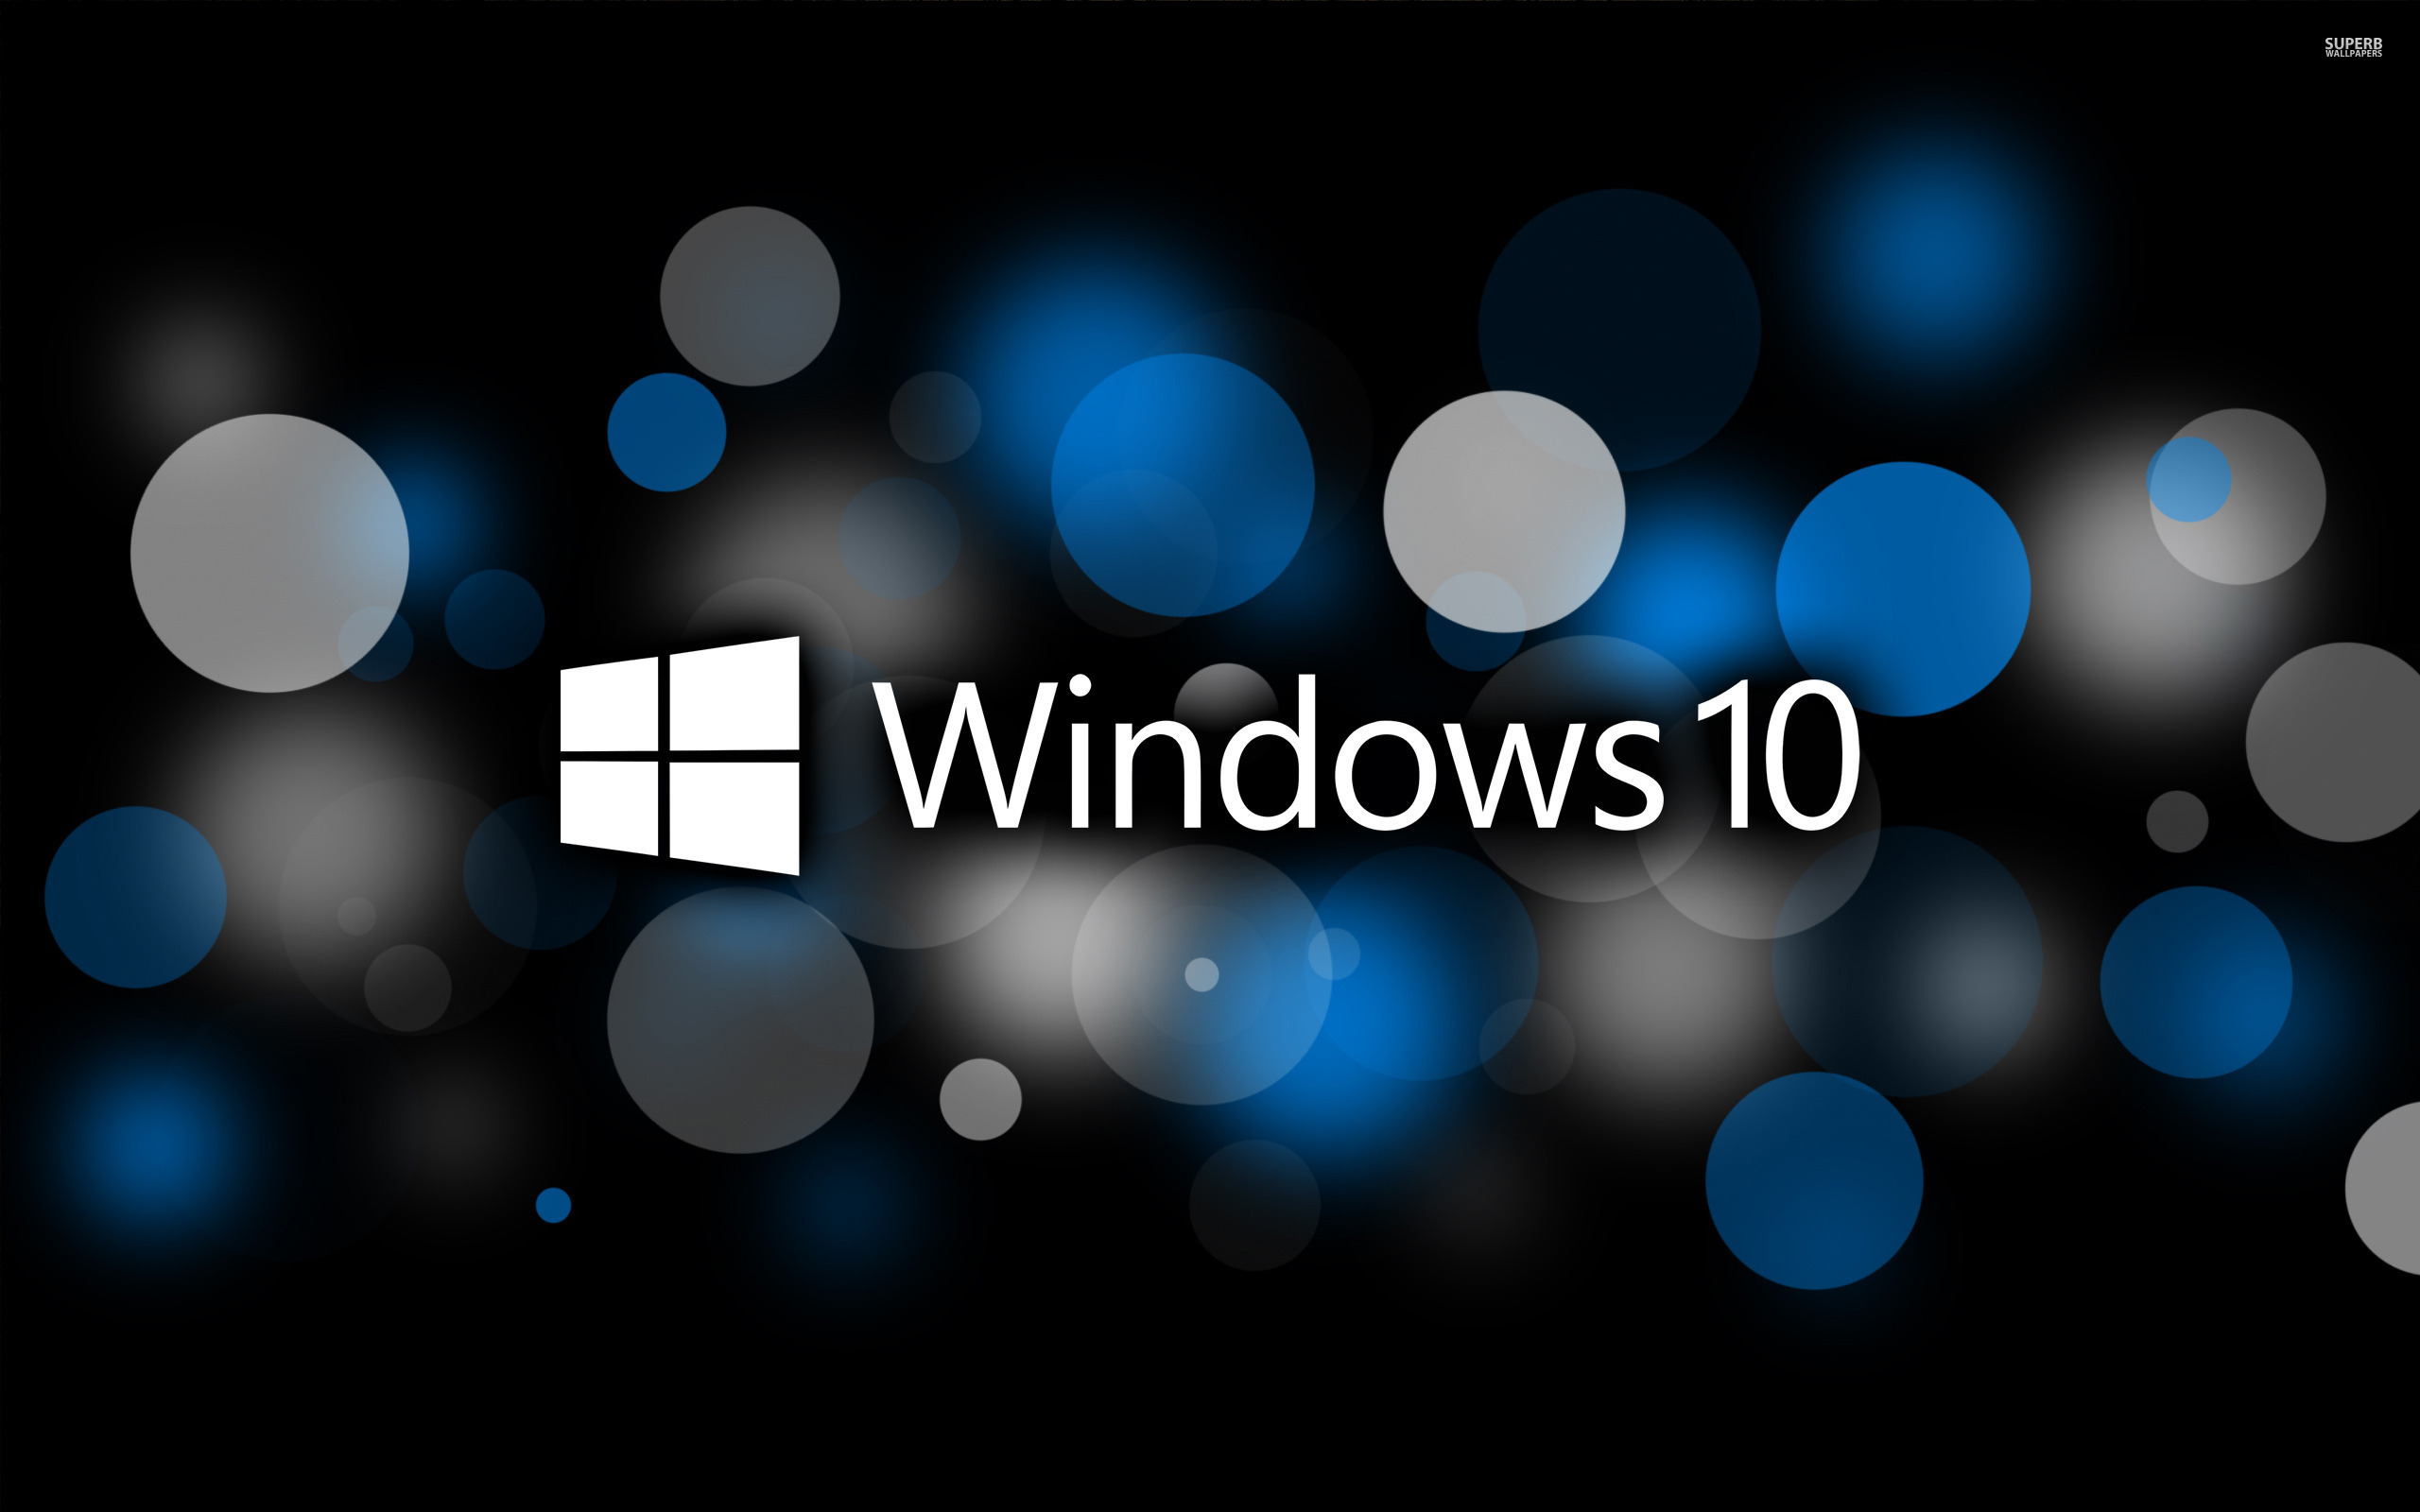 44 Hd Windows 10 Logo Wallpapers On Wallpapersafari